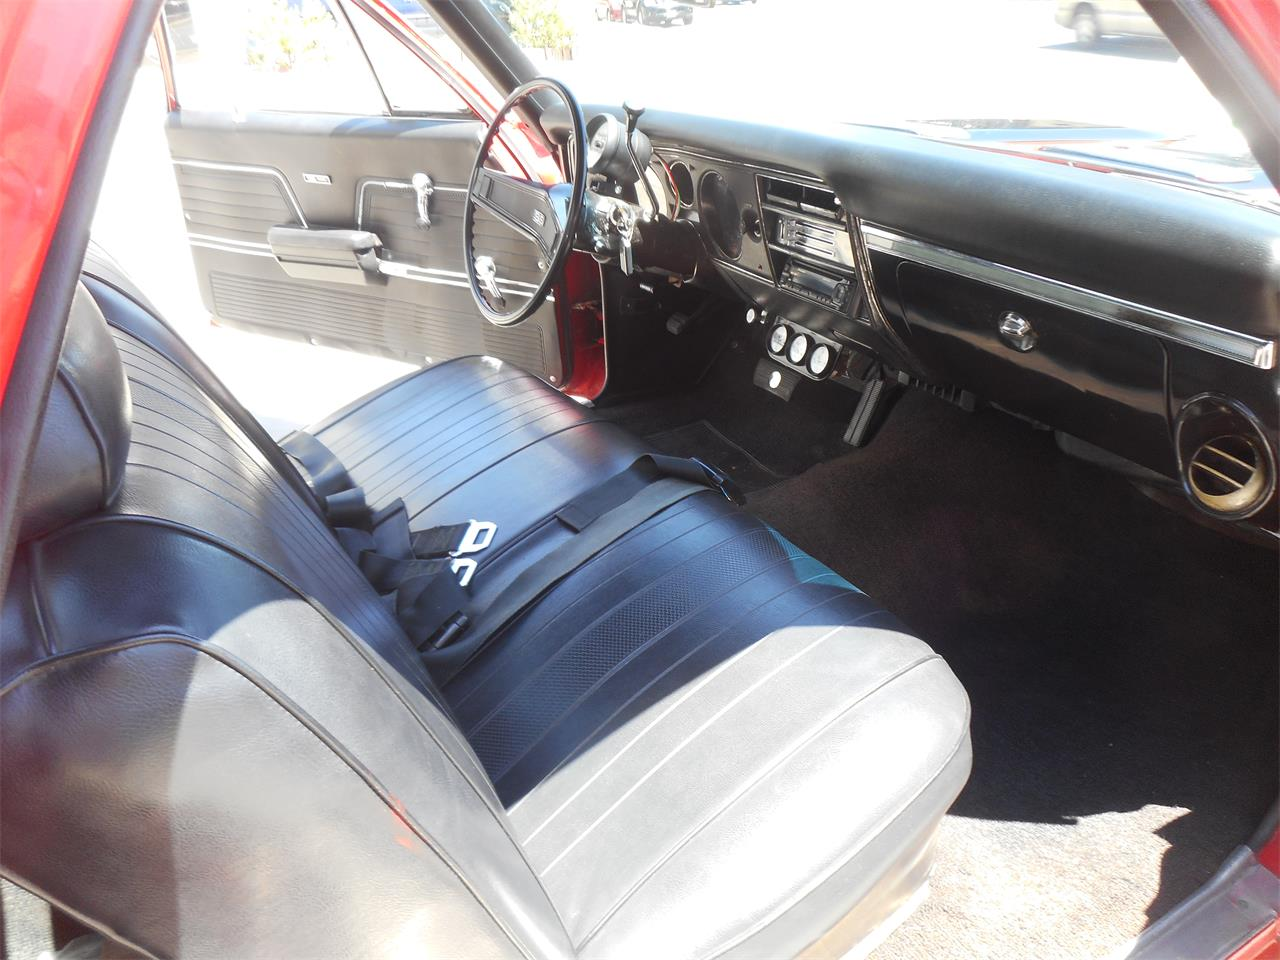 1969 Chevrolet El Camino (CC-1359499) for sale in Gilroy, California